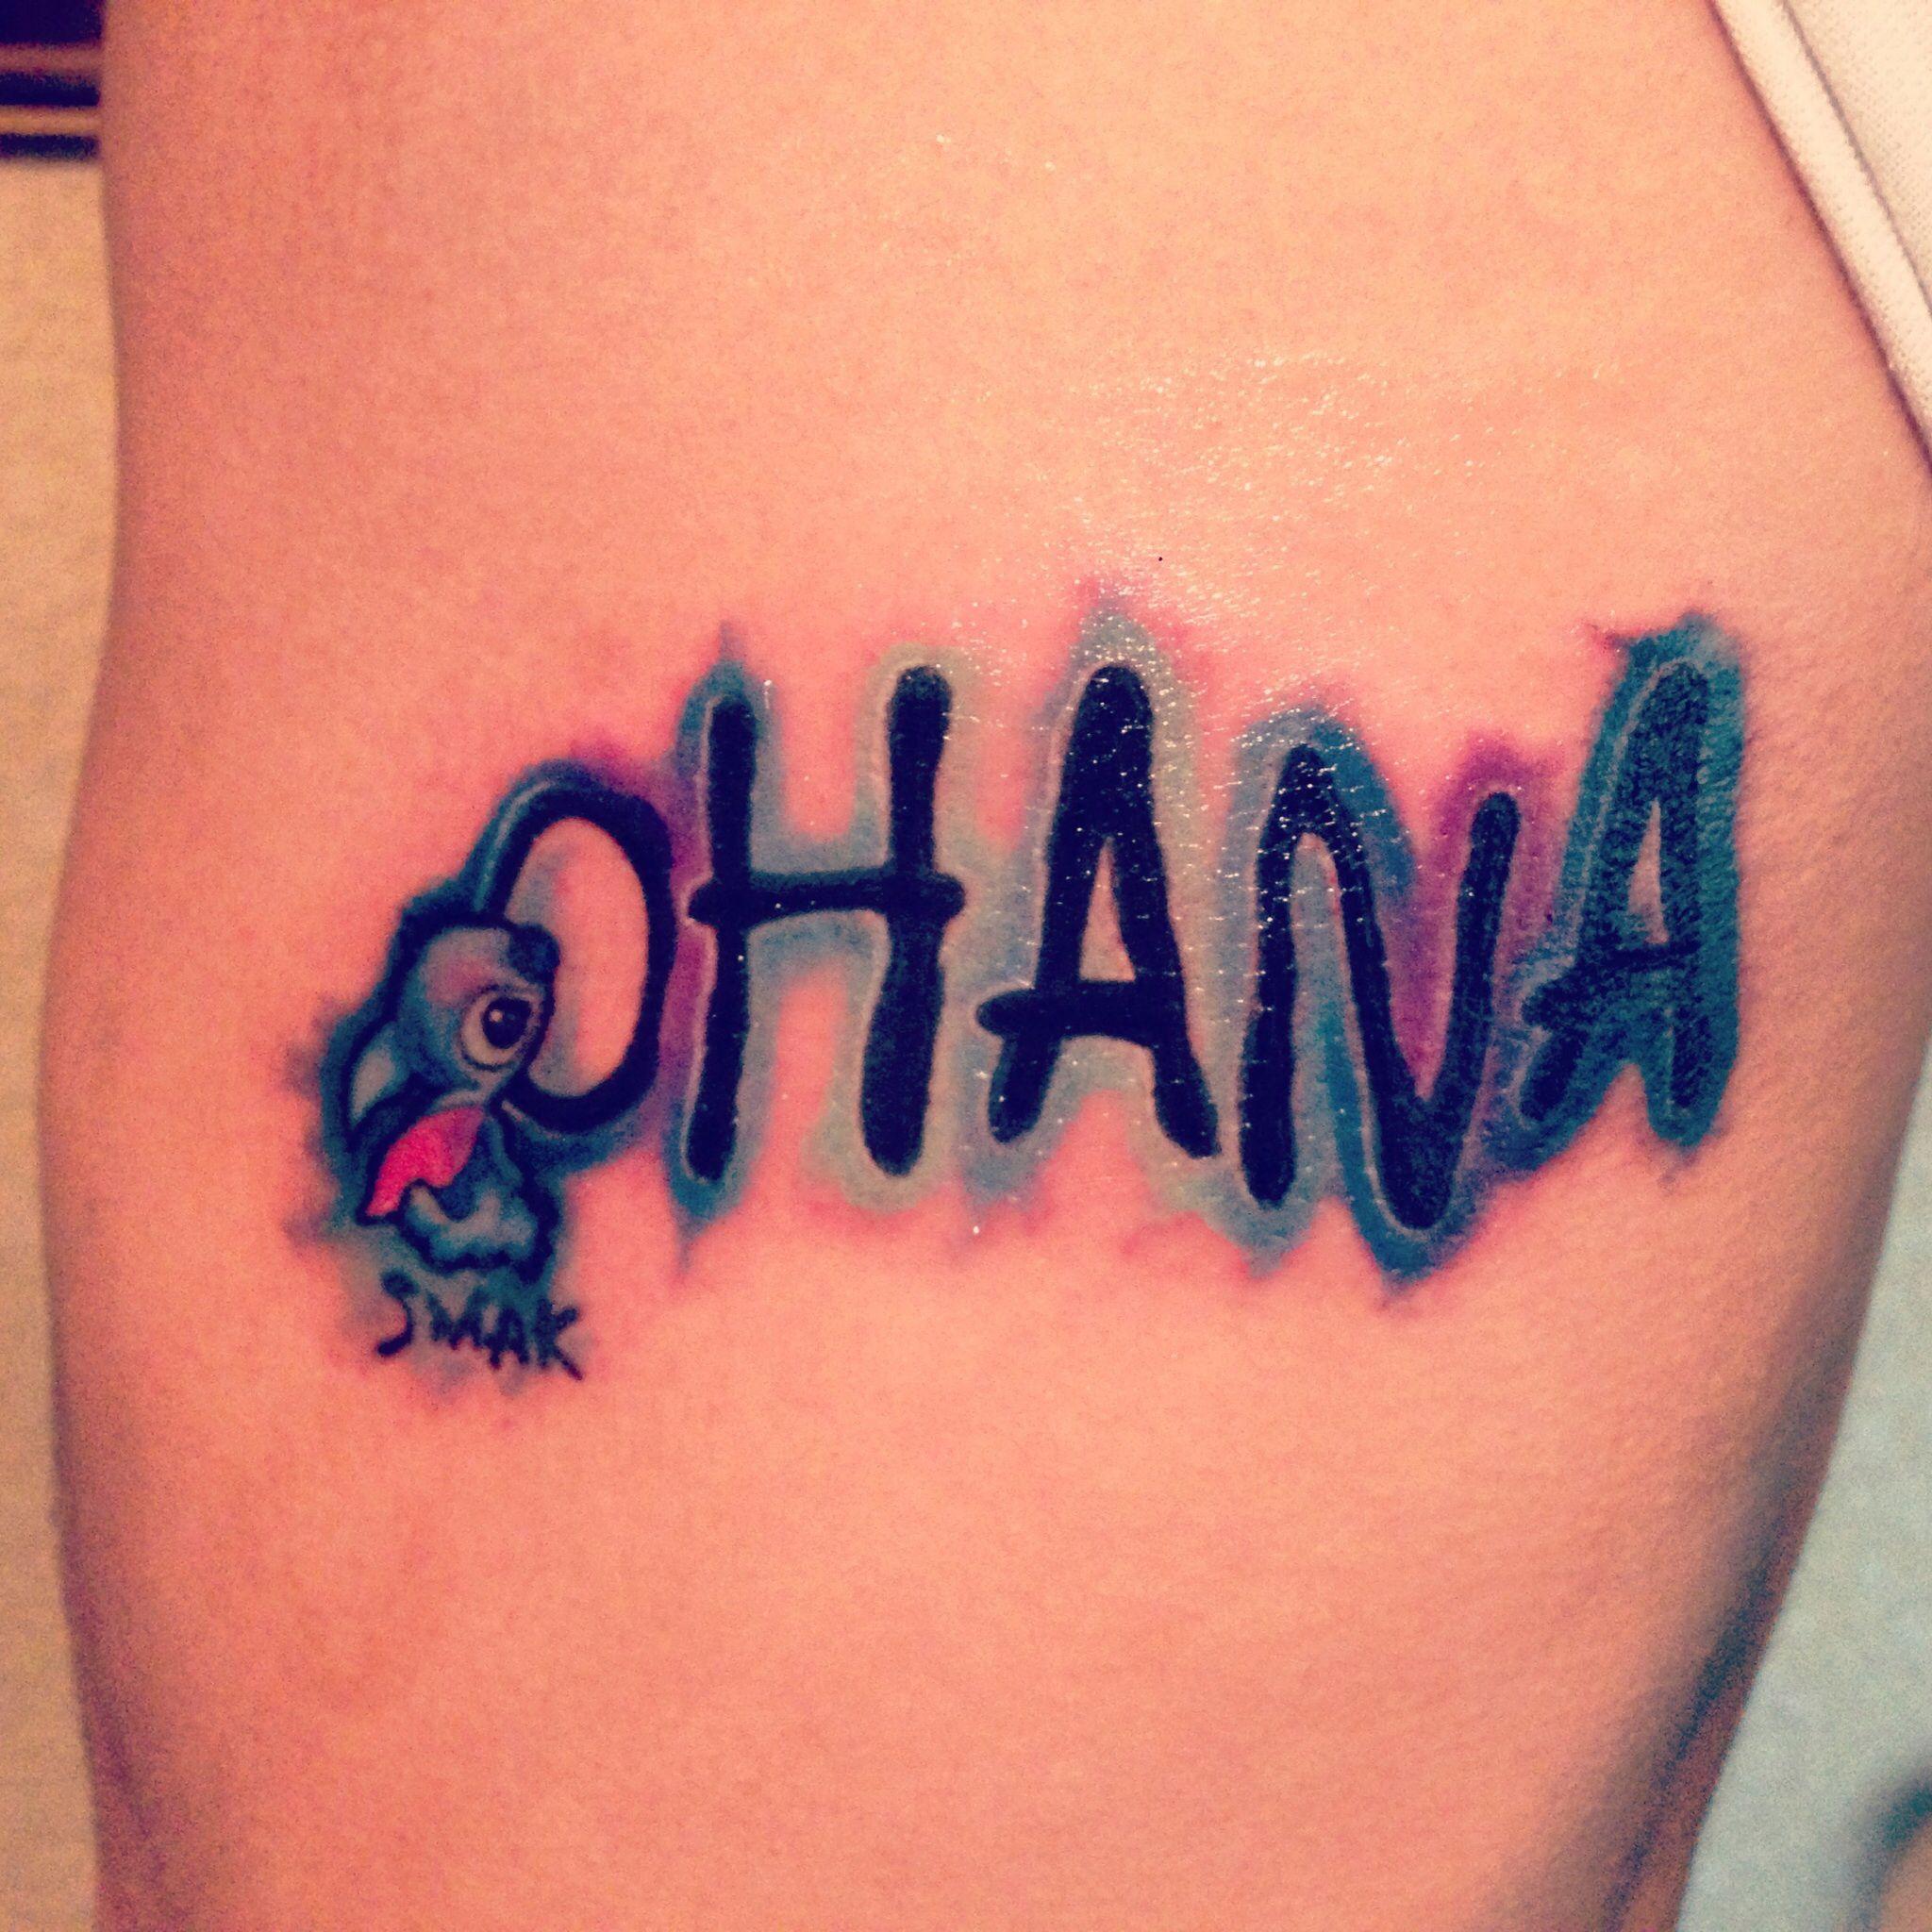 ohana tattoos pinterest ohana and tattoo. Black Bedroom Furniture Sets. Home Design Ideas